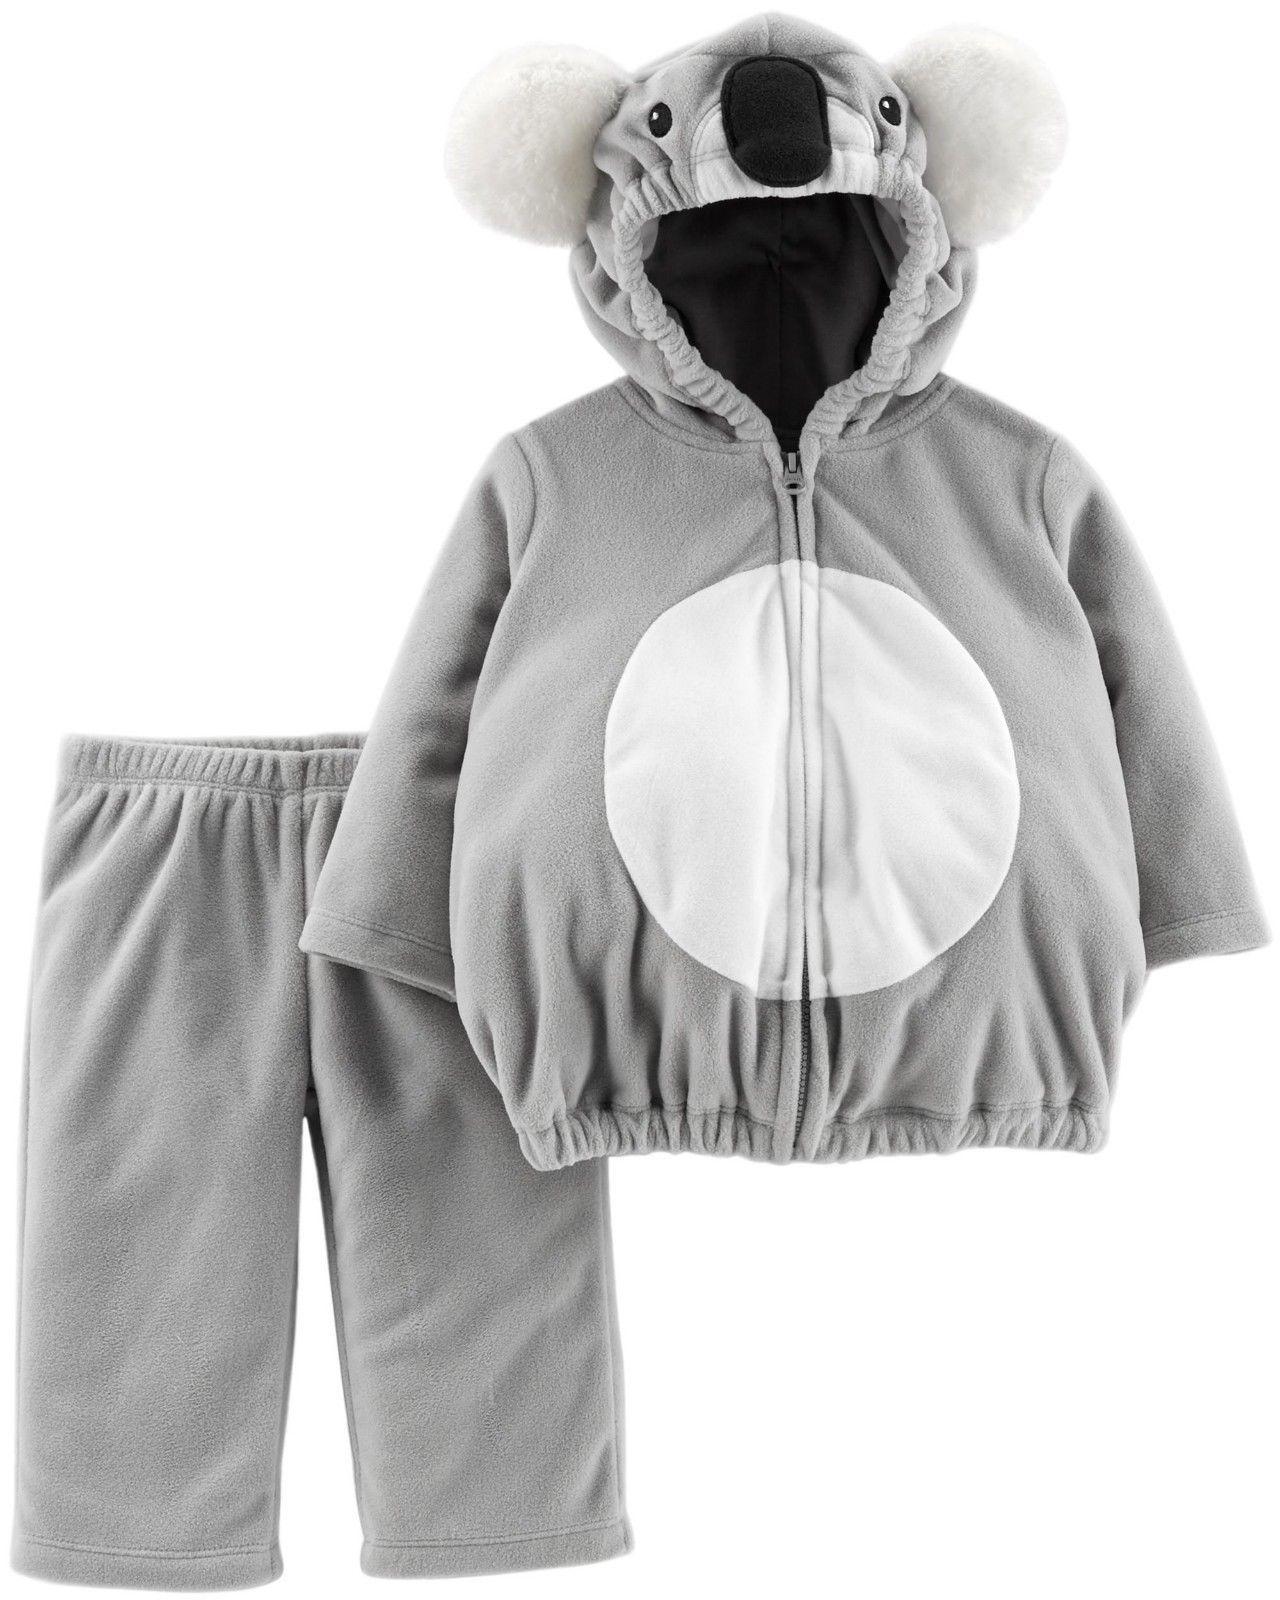 NEW NWT Carters Koala Halloween Costume Boy or Girl 12 18 or 24 Month